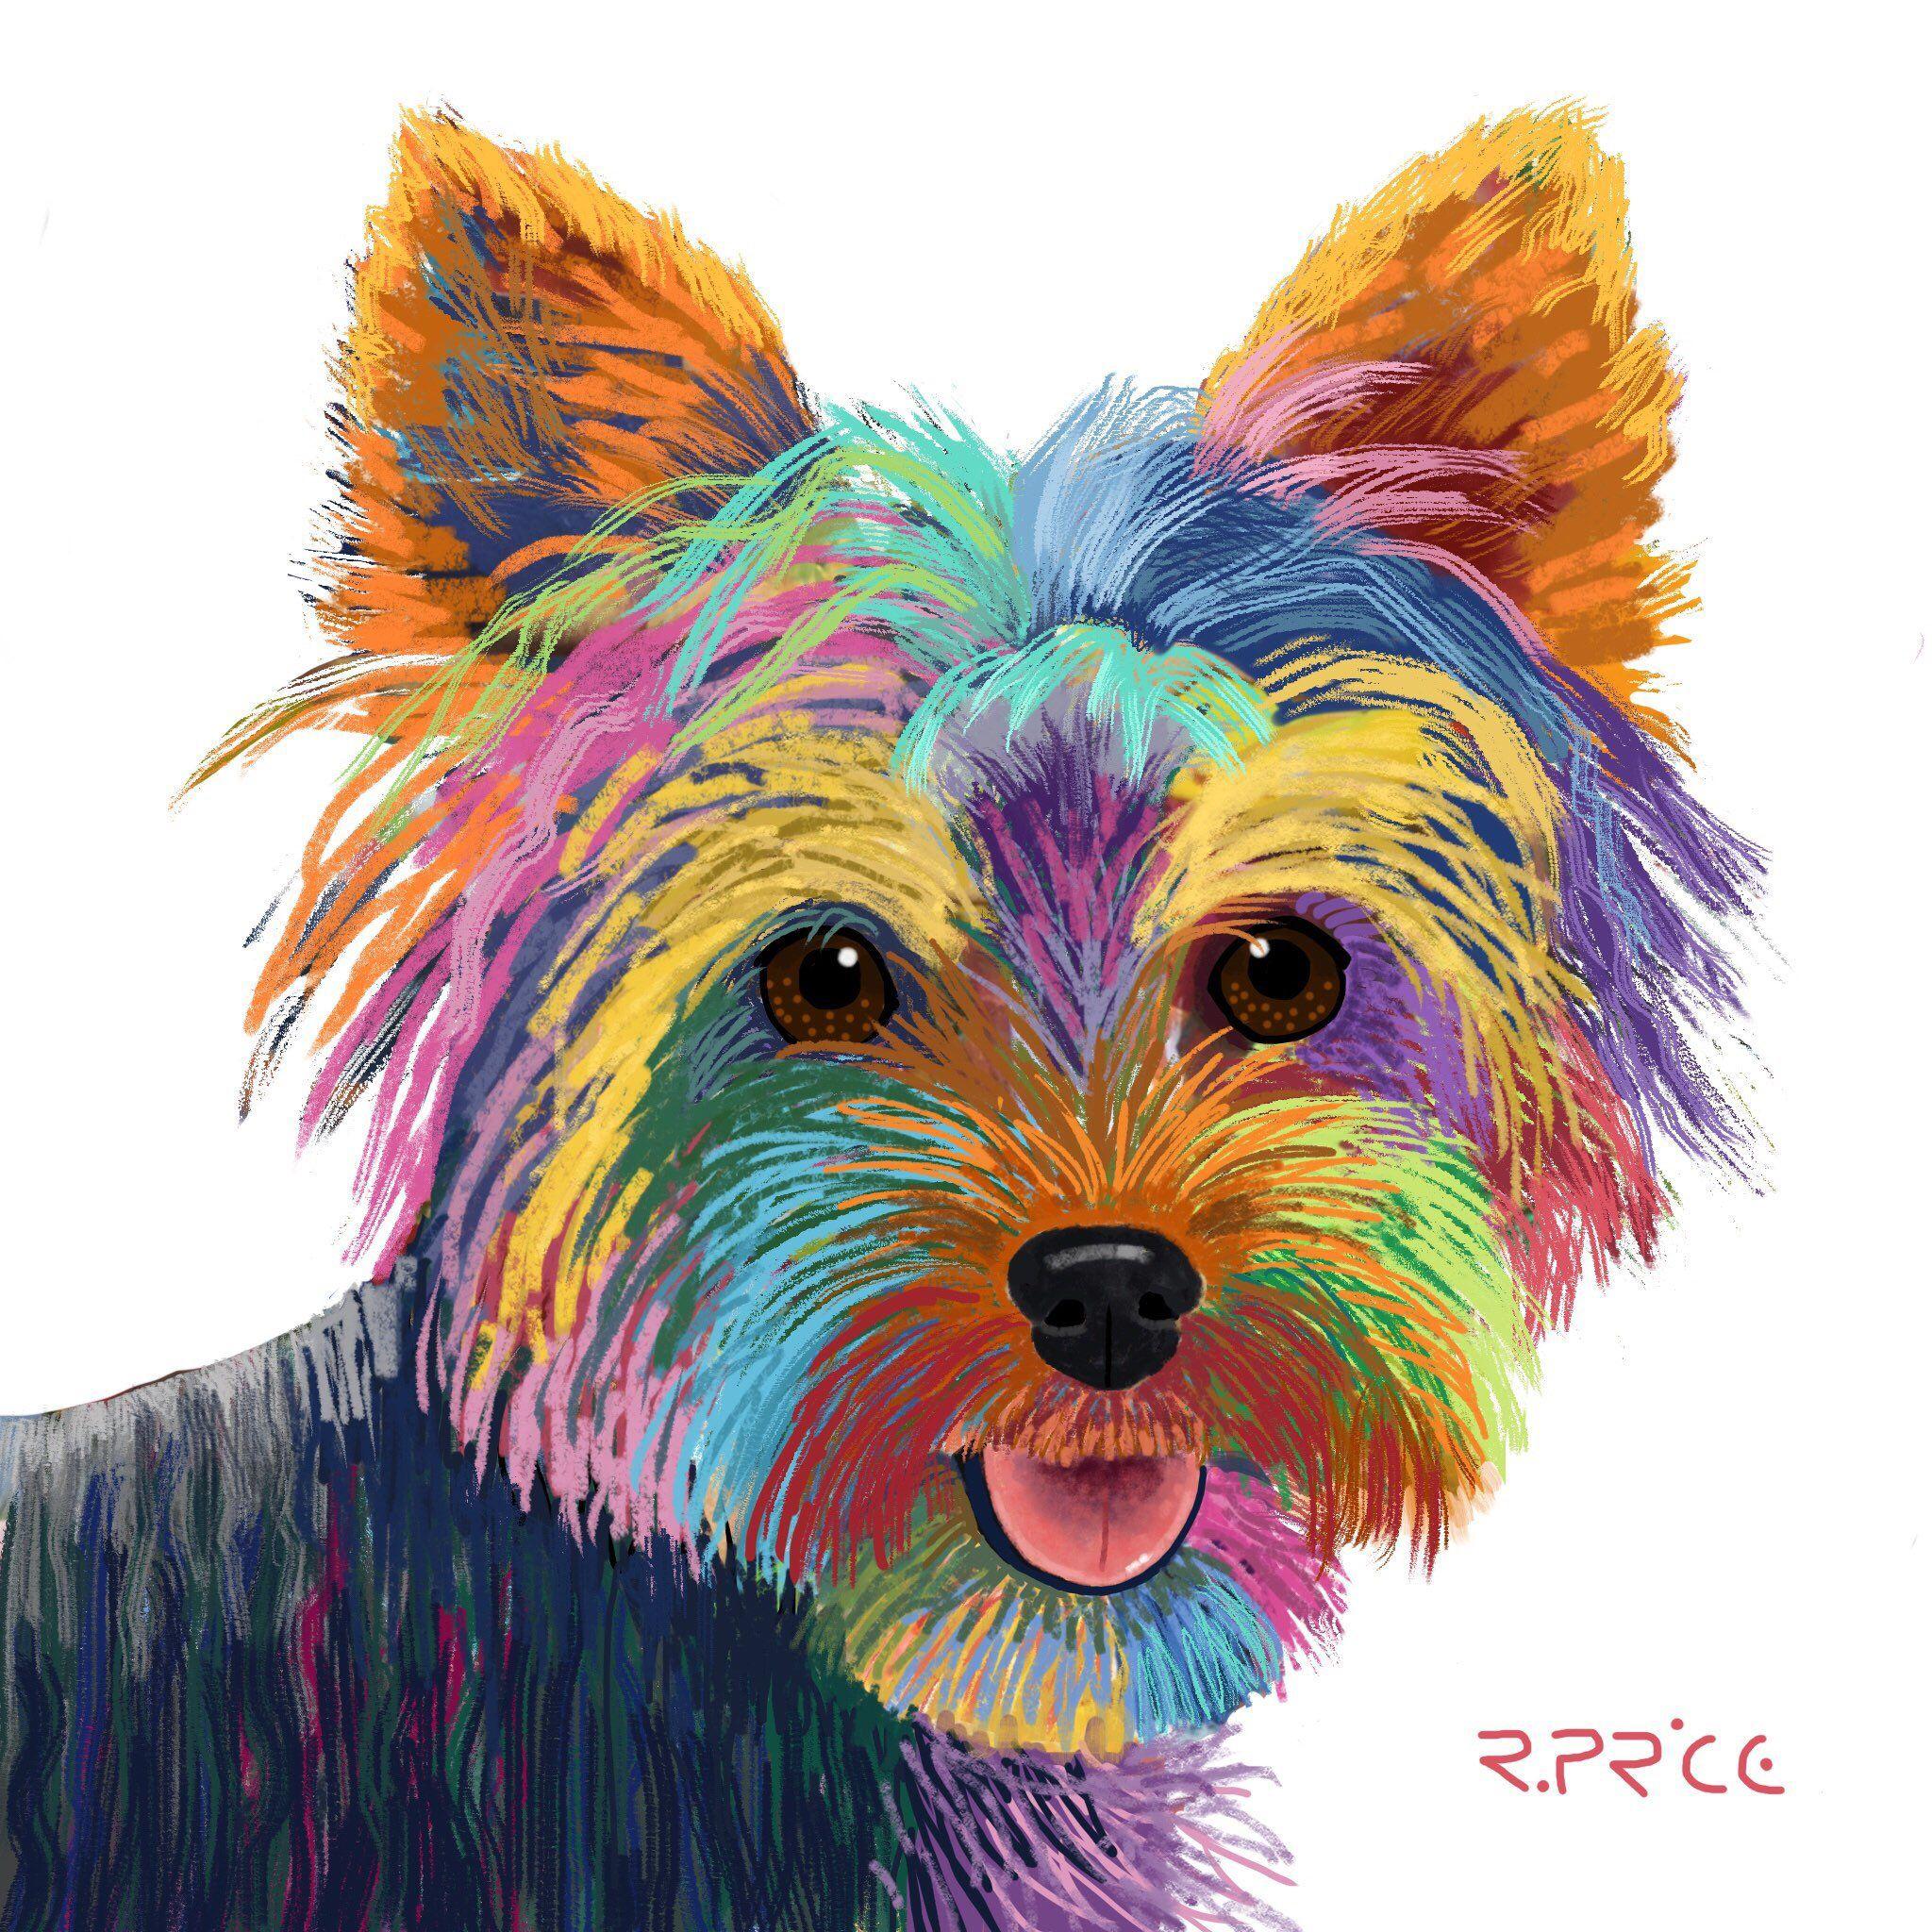 Yorkie Yorkshire Terrier Art Yorkie Image Yorkie Fine Art Etsy Yorkie Painting Fine Art Prints Dachshund Painting